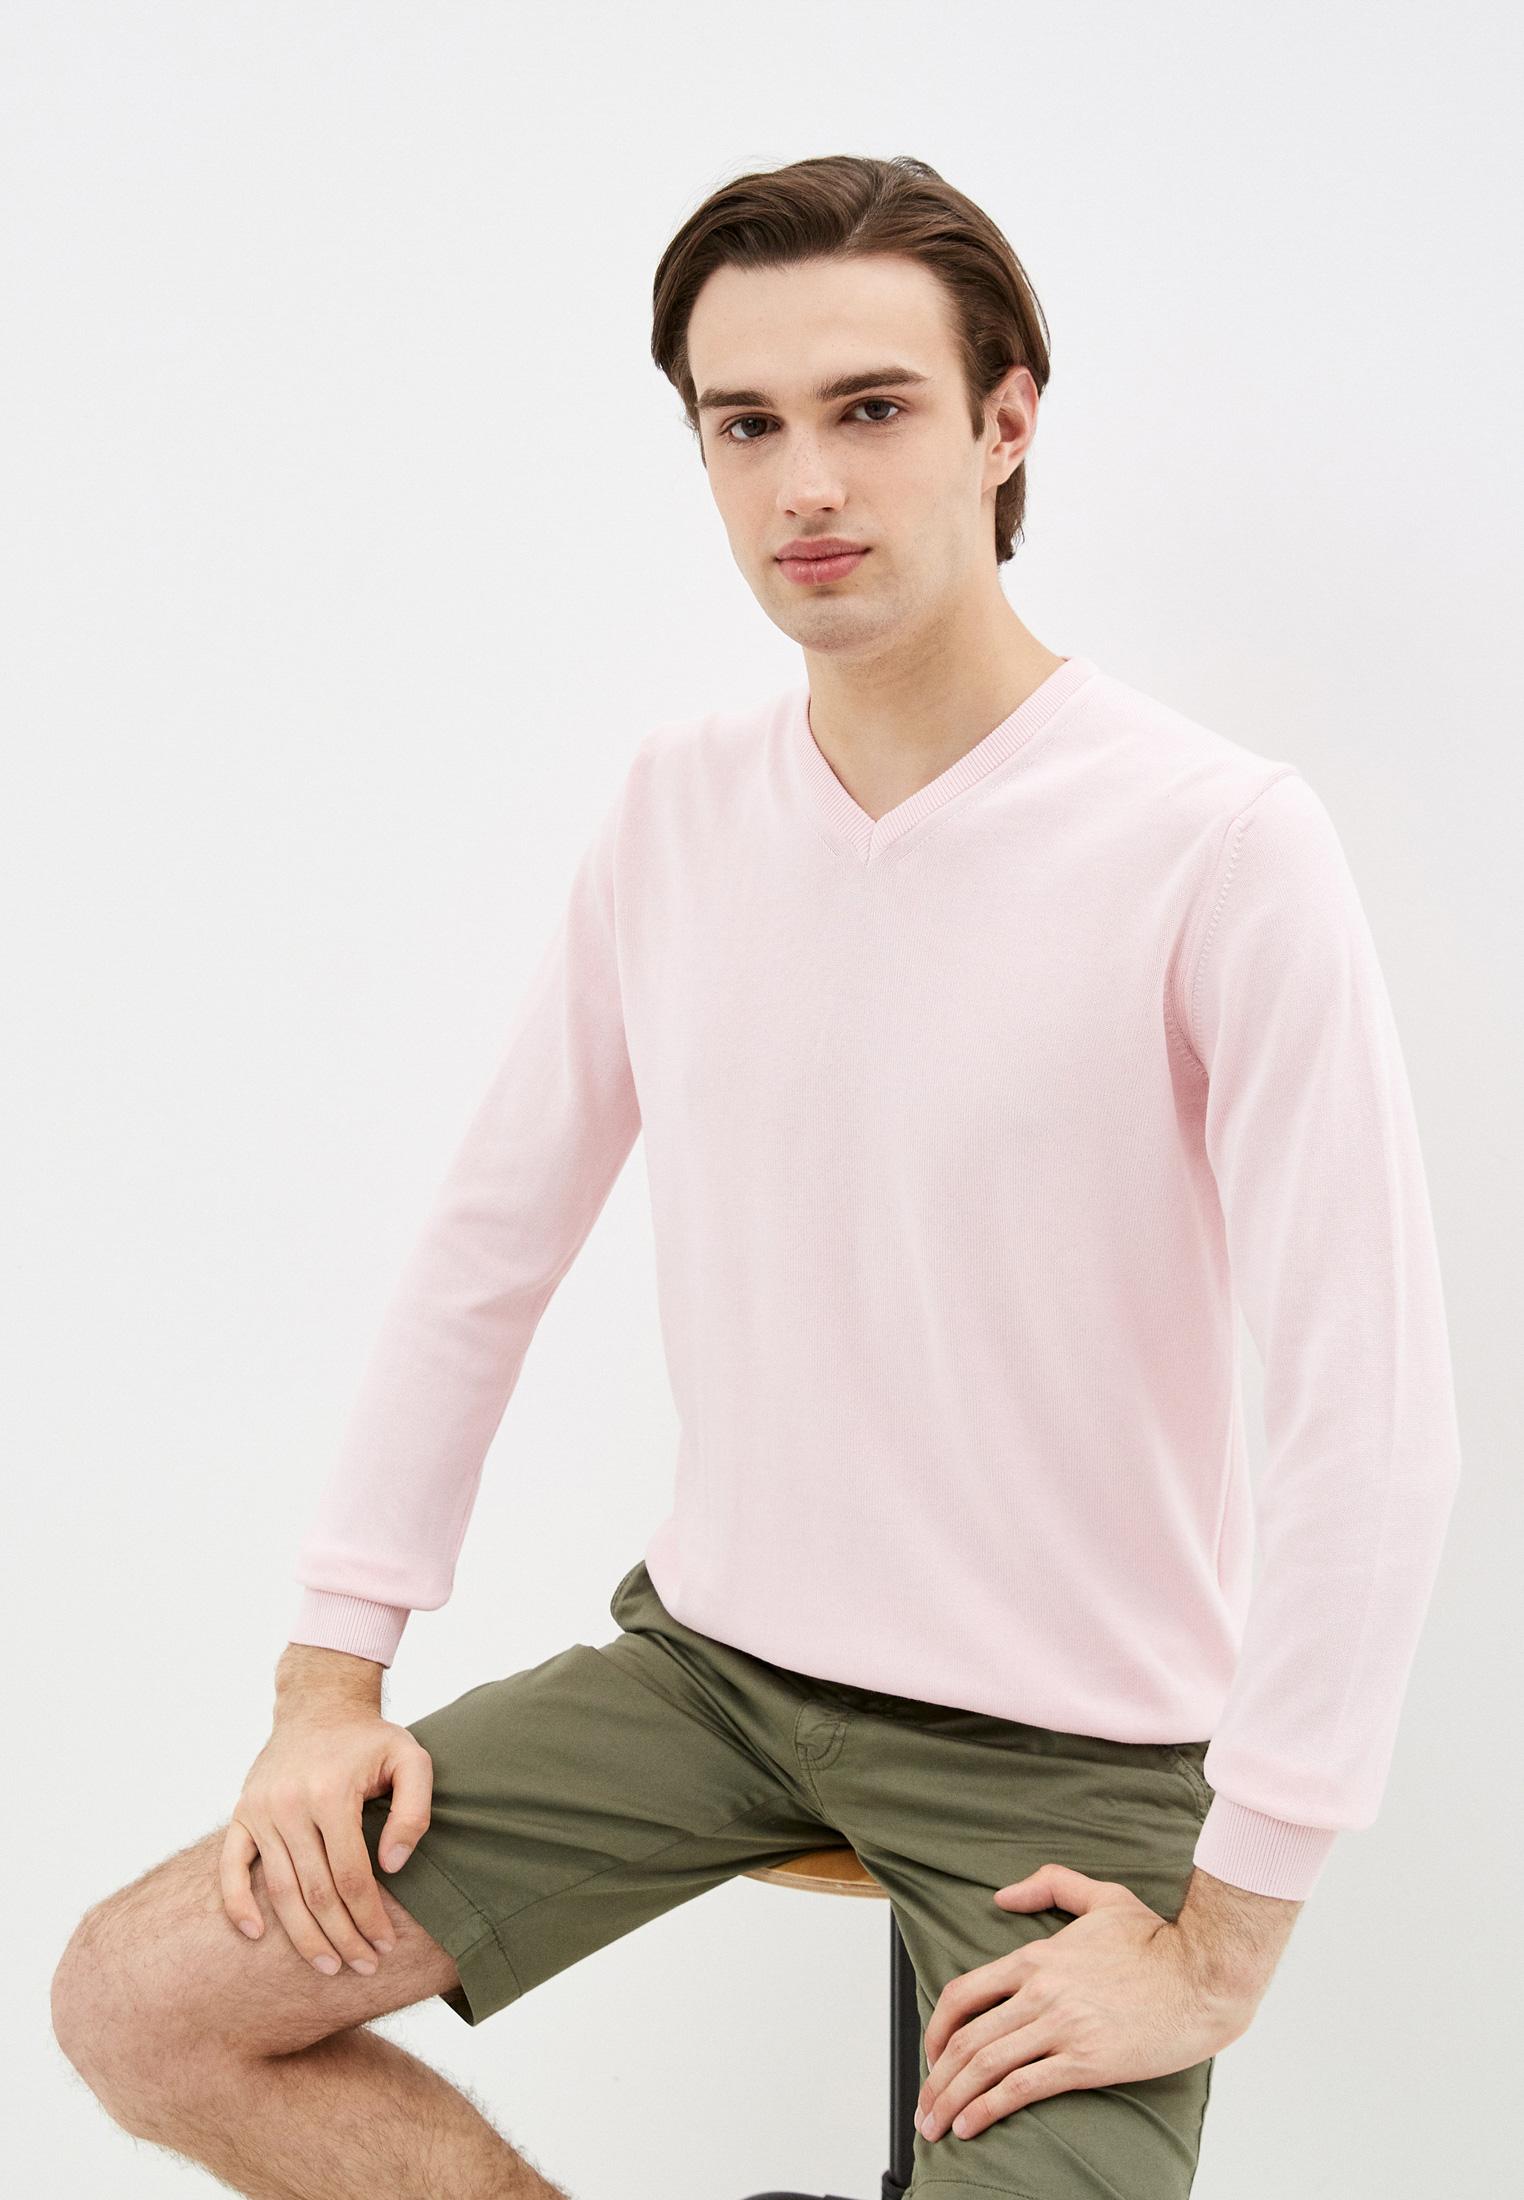 Пуловер JIMMY SANDERS (Джимми Сандерс) Пуловер Jimmy Sanders